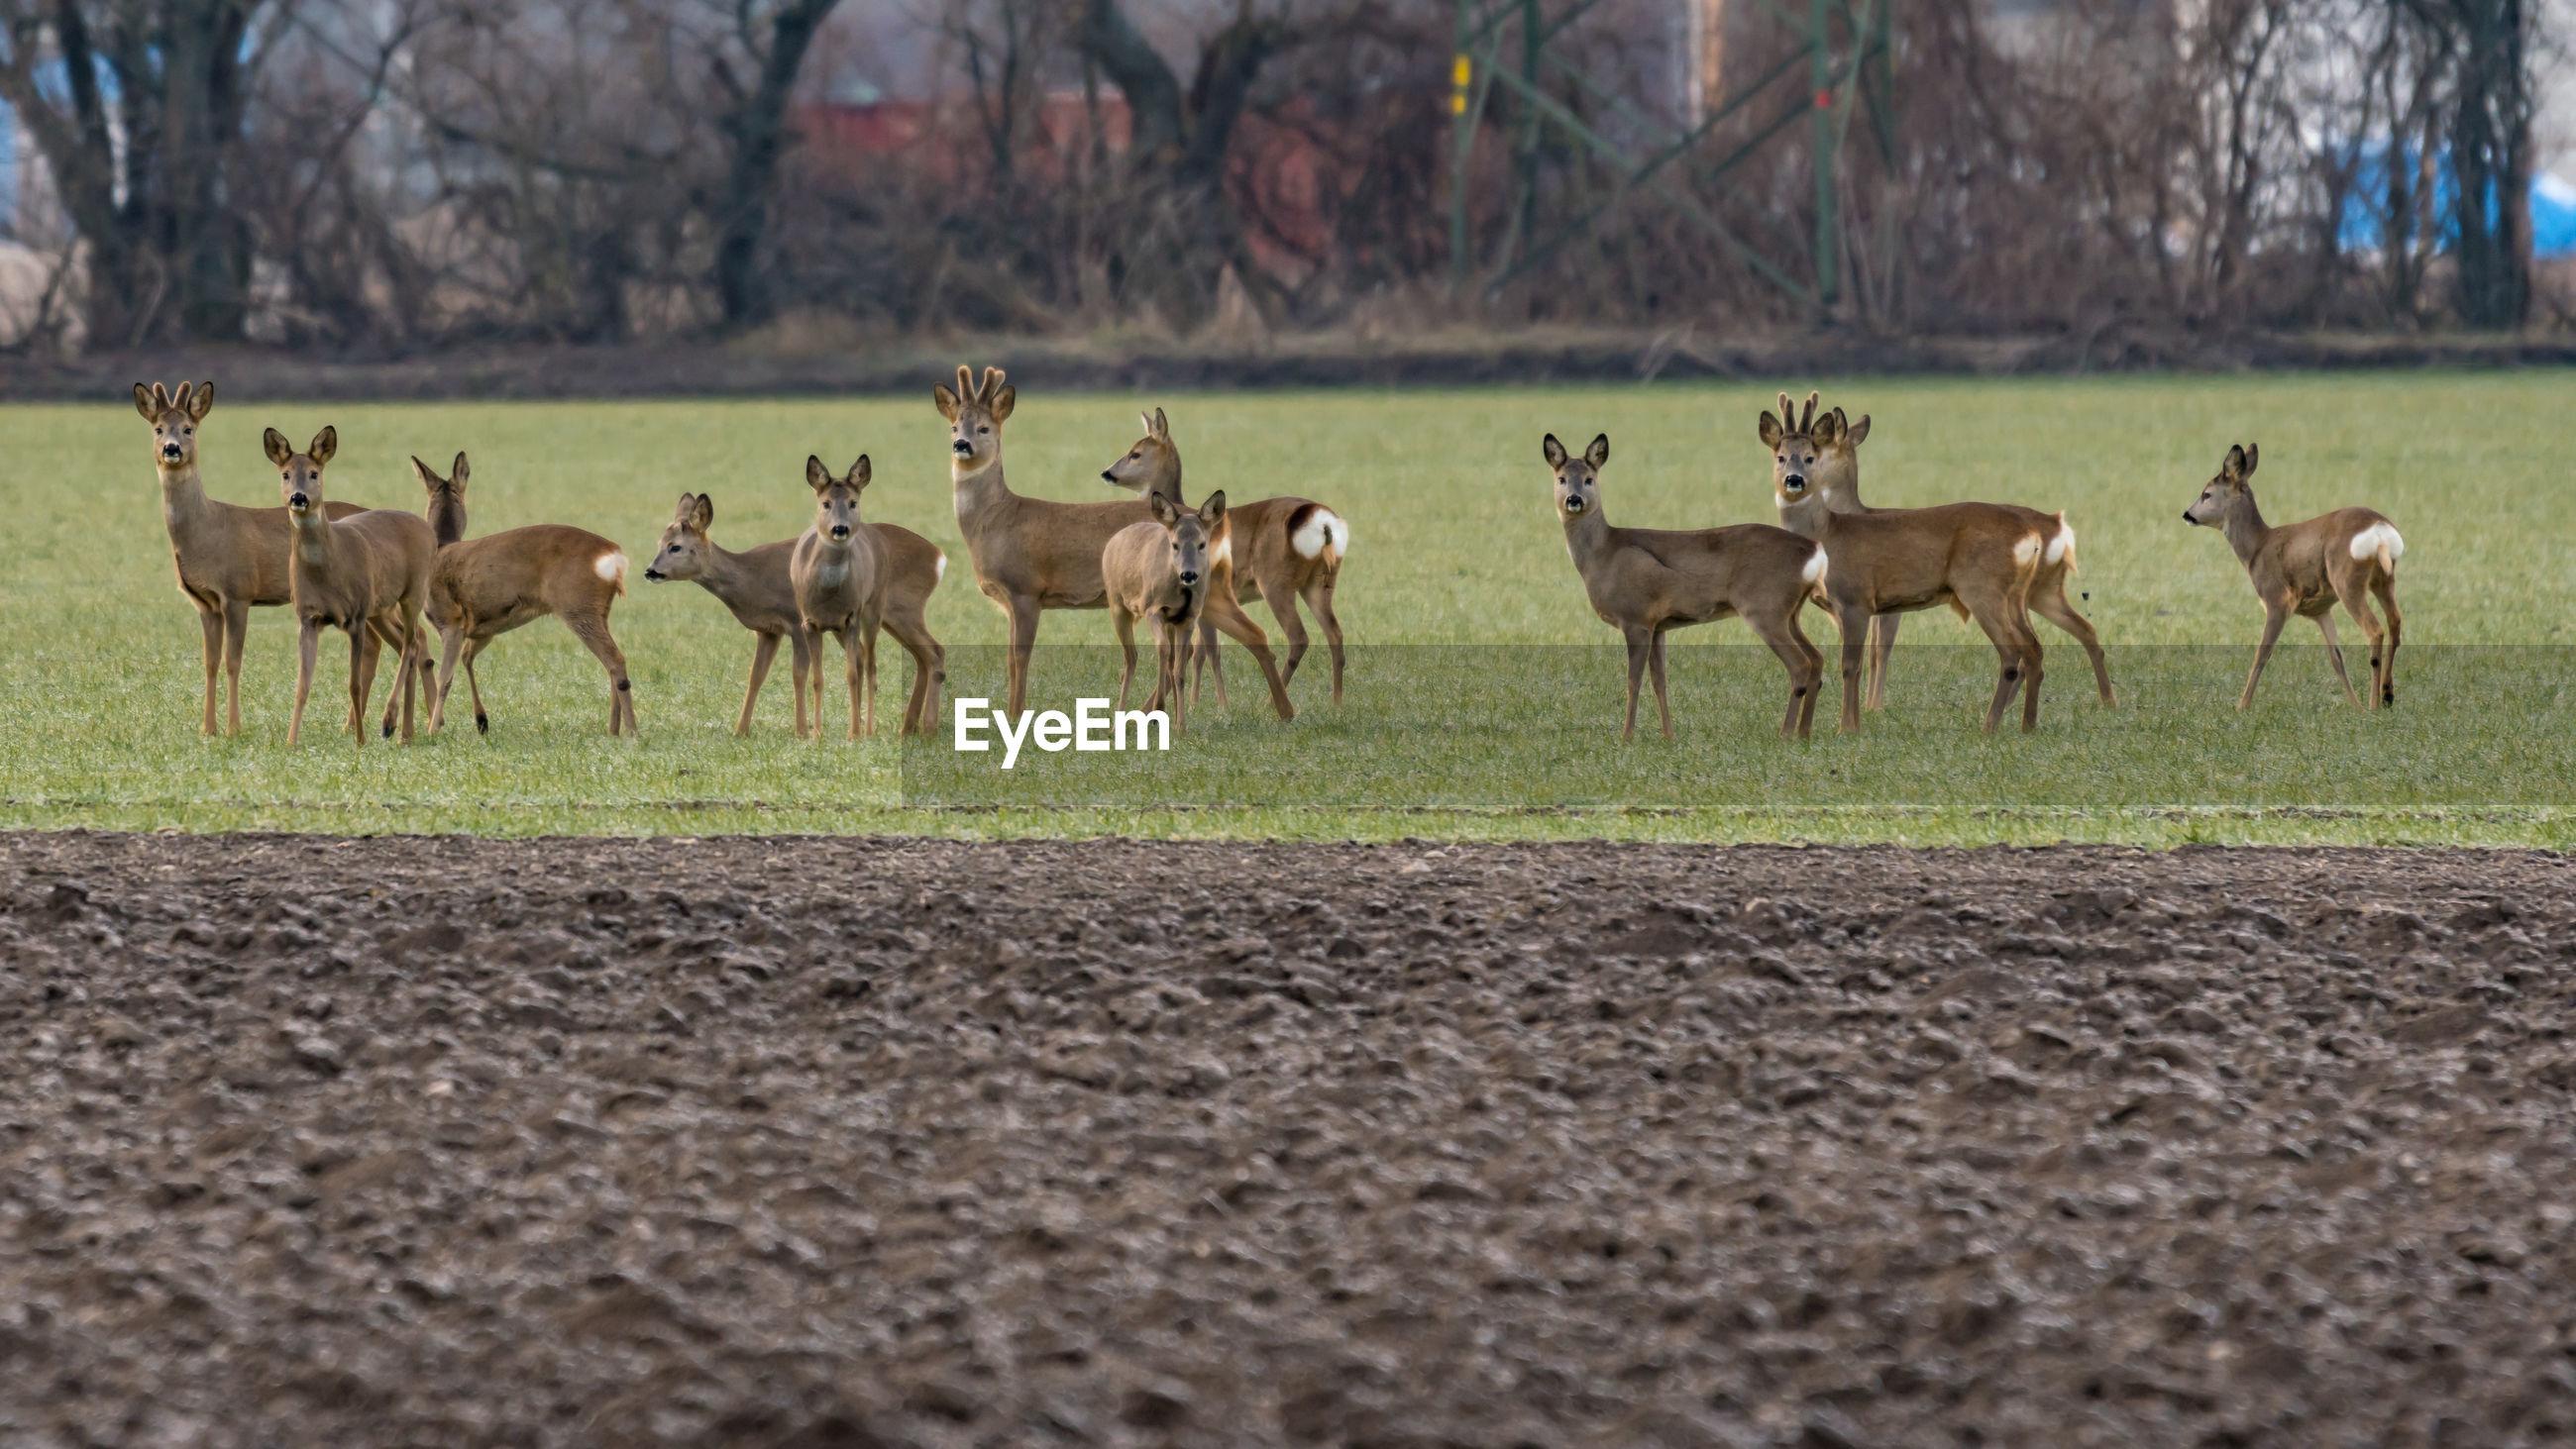 Deers in a field